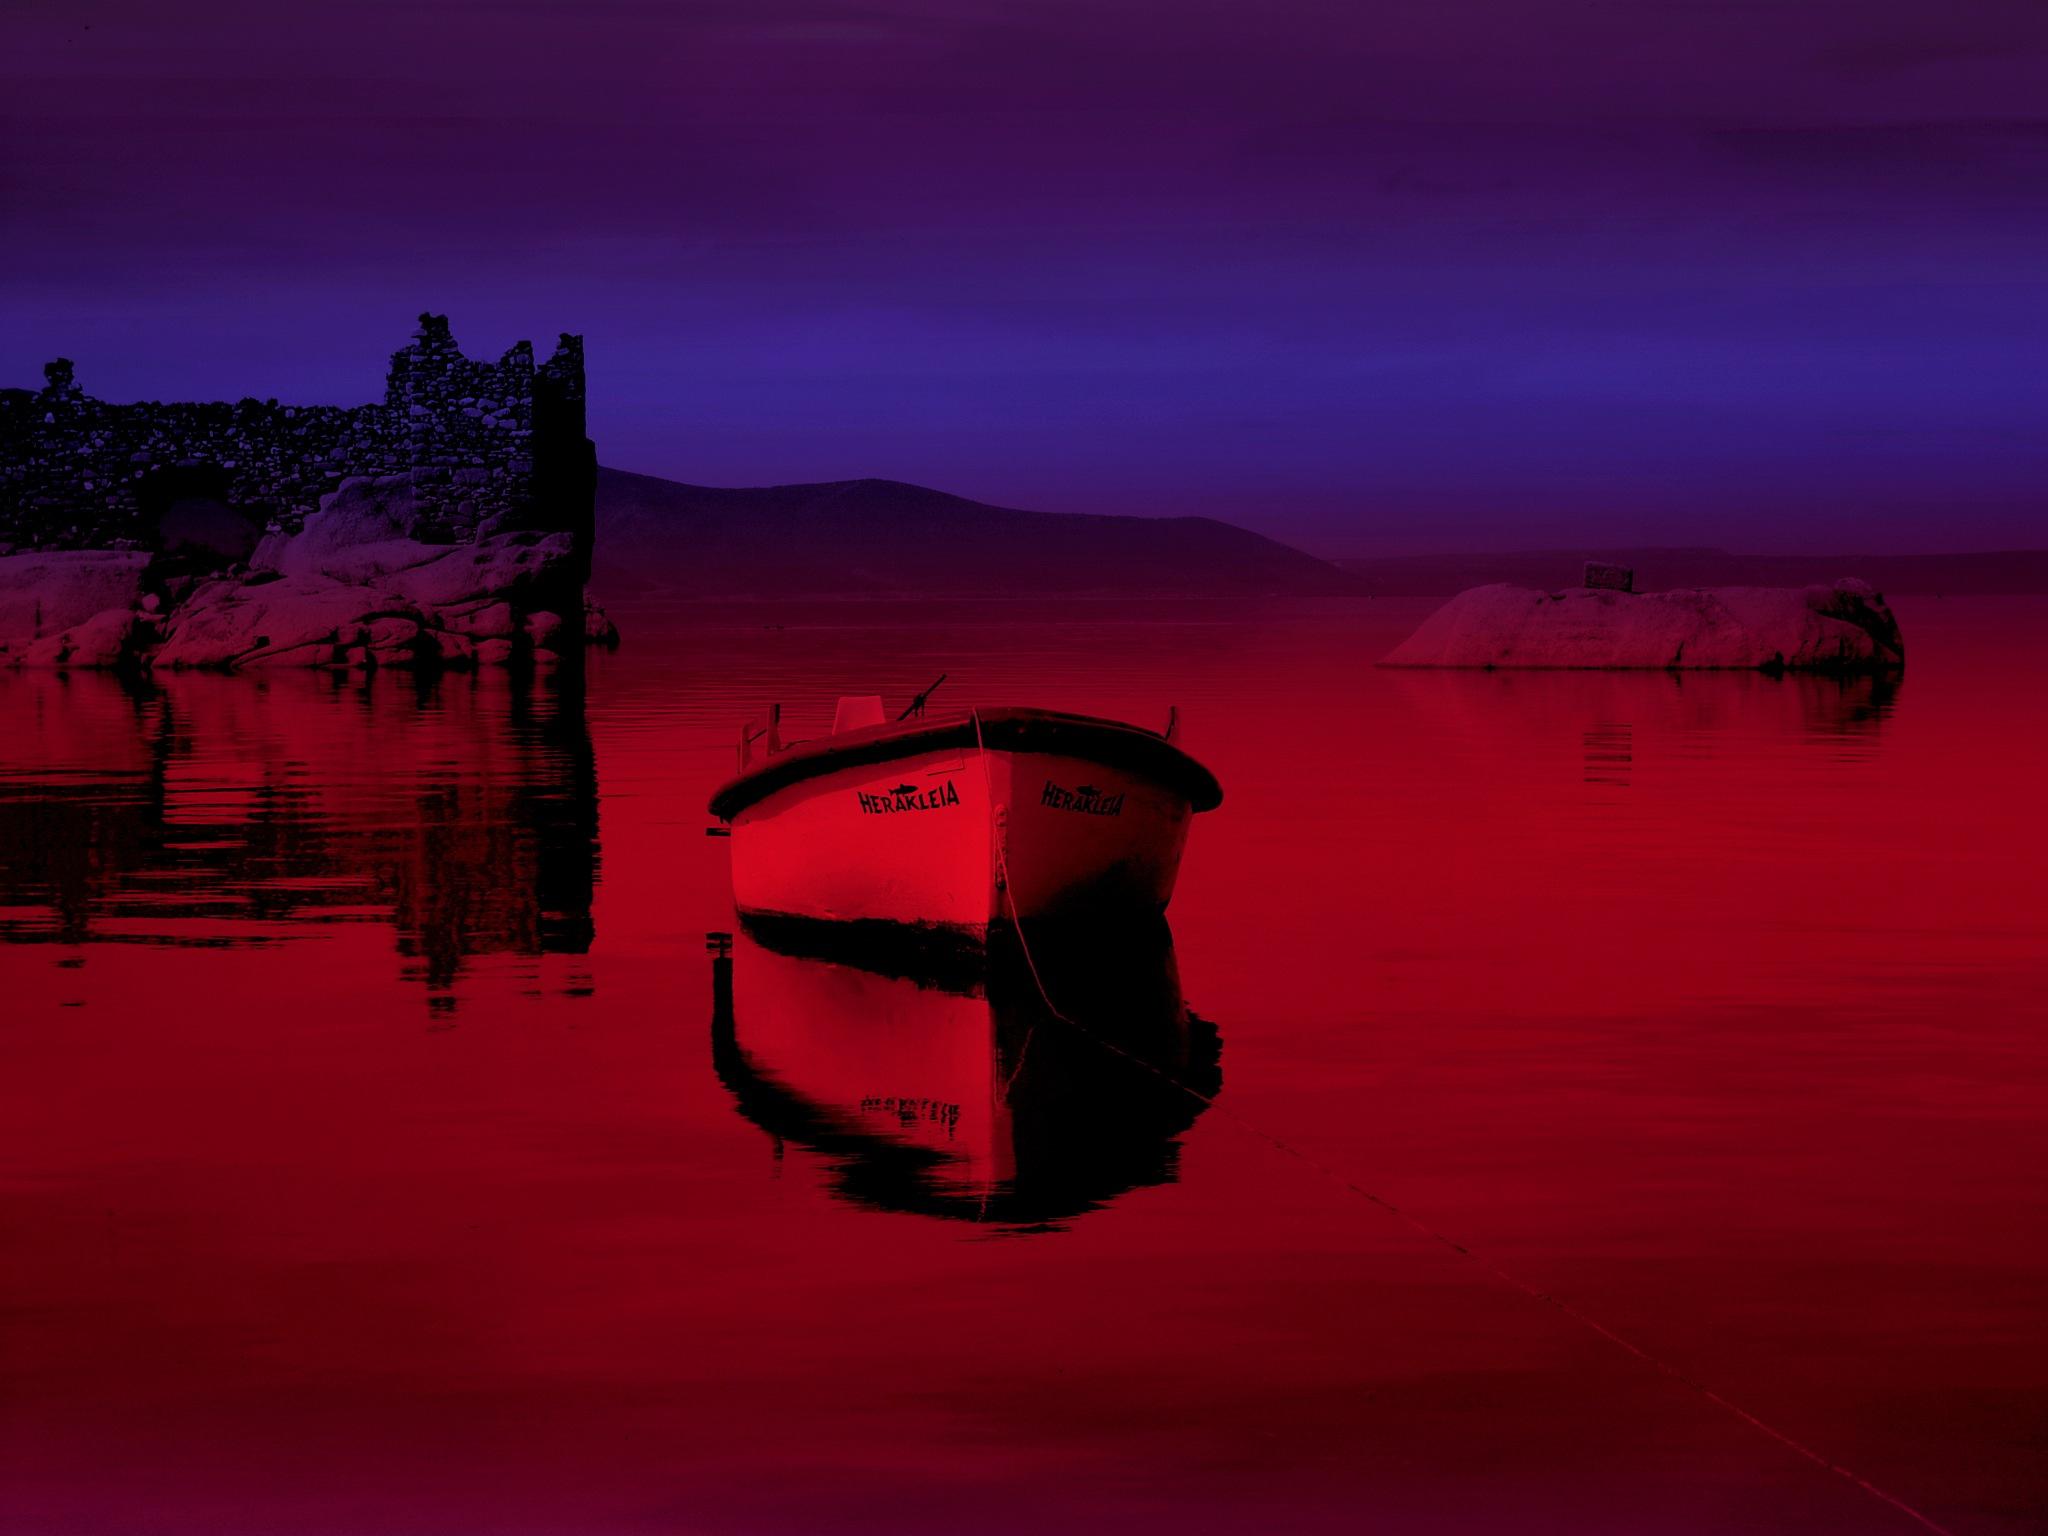 A BEAUTIFUL INSTANT FROM BAFA LAKE, HERAKLEIA by Akin Saner